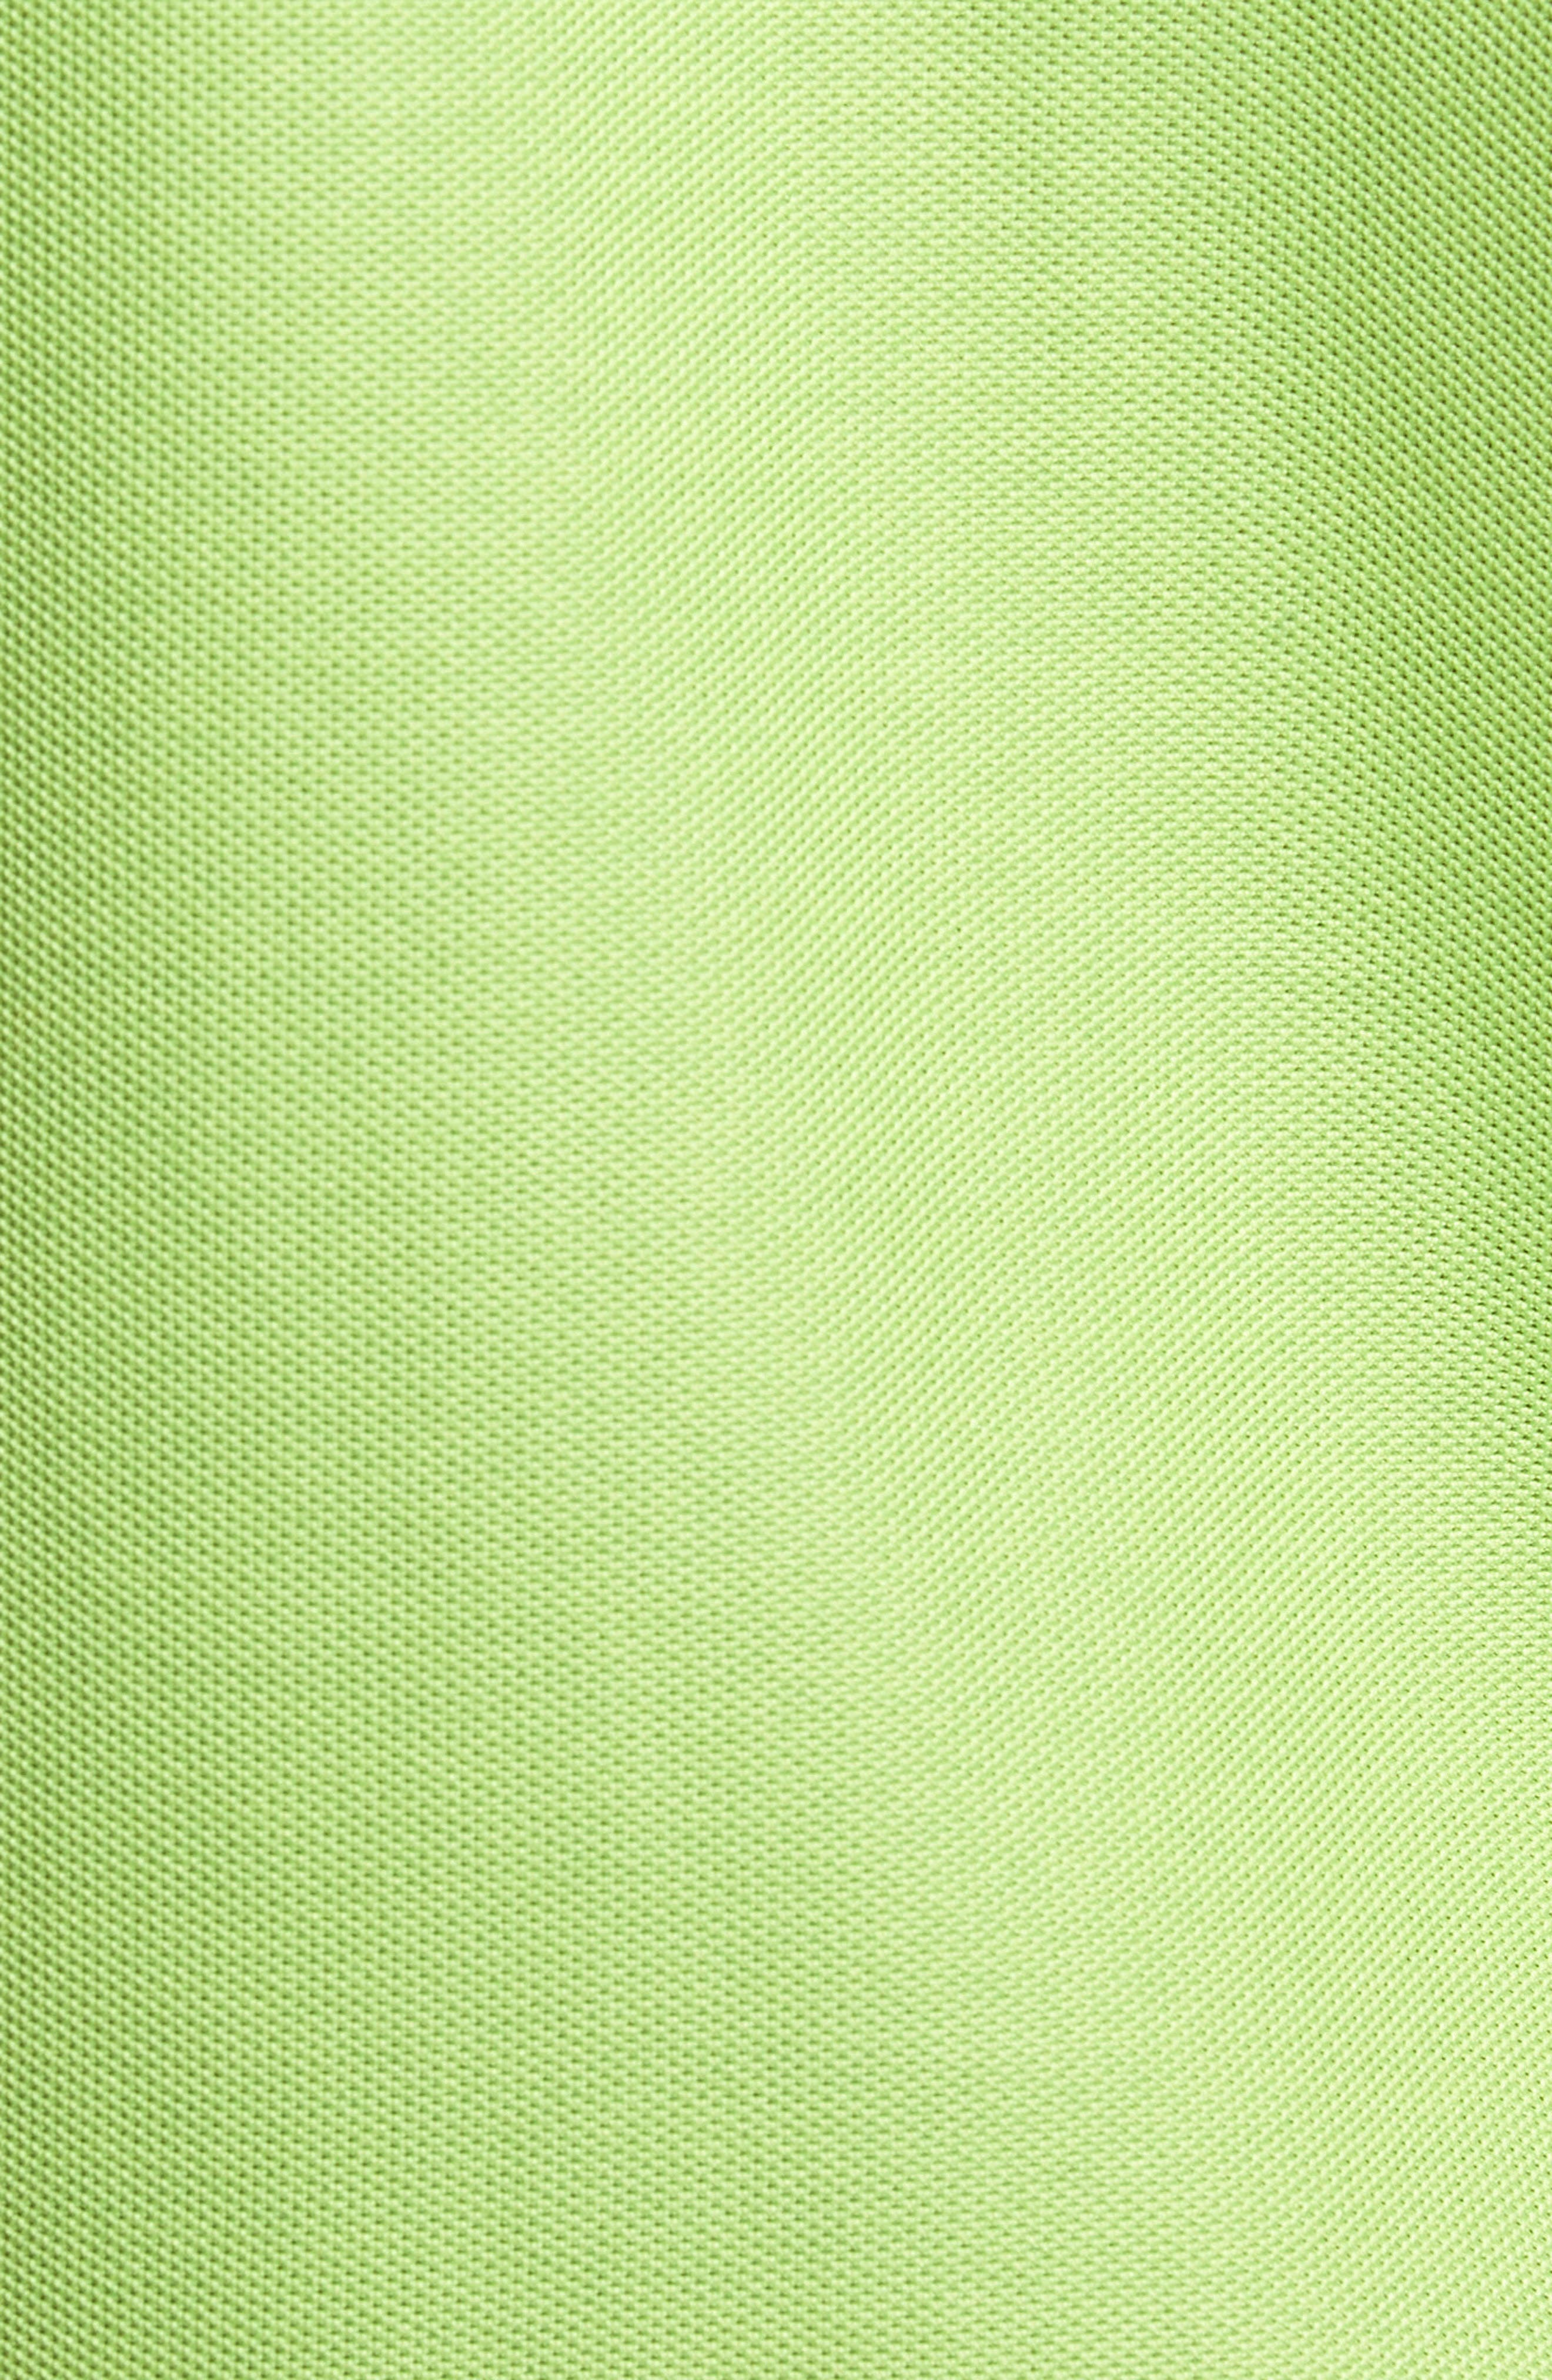 'The Emfielder' Original Fit Piqué Polo,                             Alternate thumbnail 4, color,                             Caicos Green